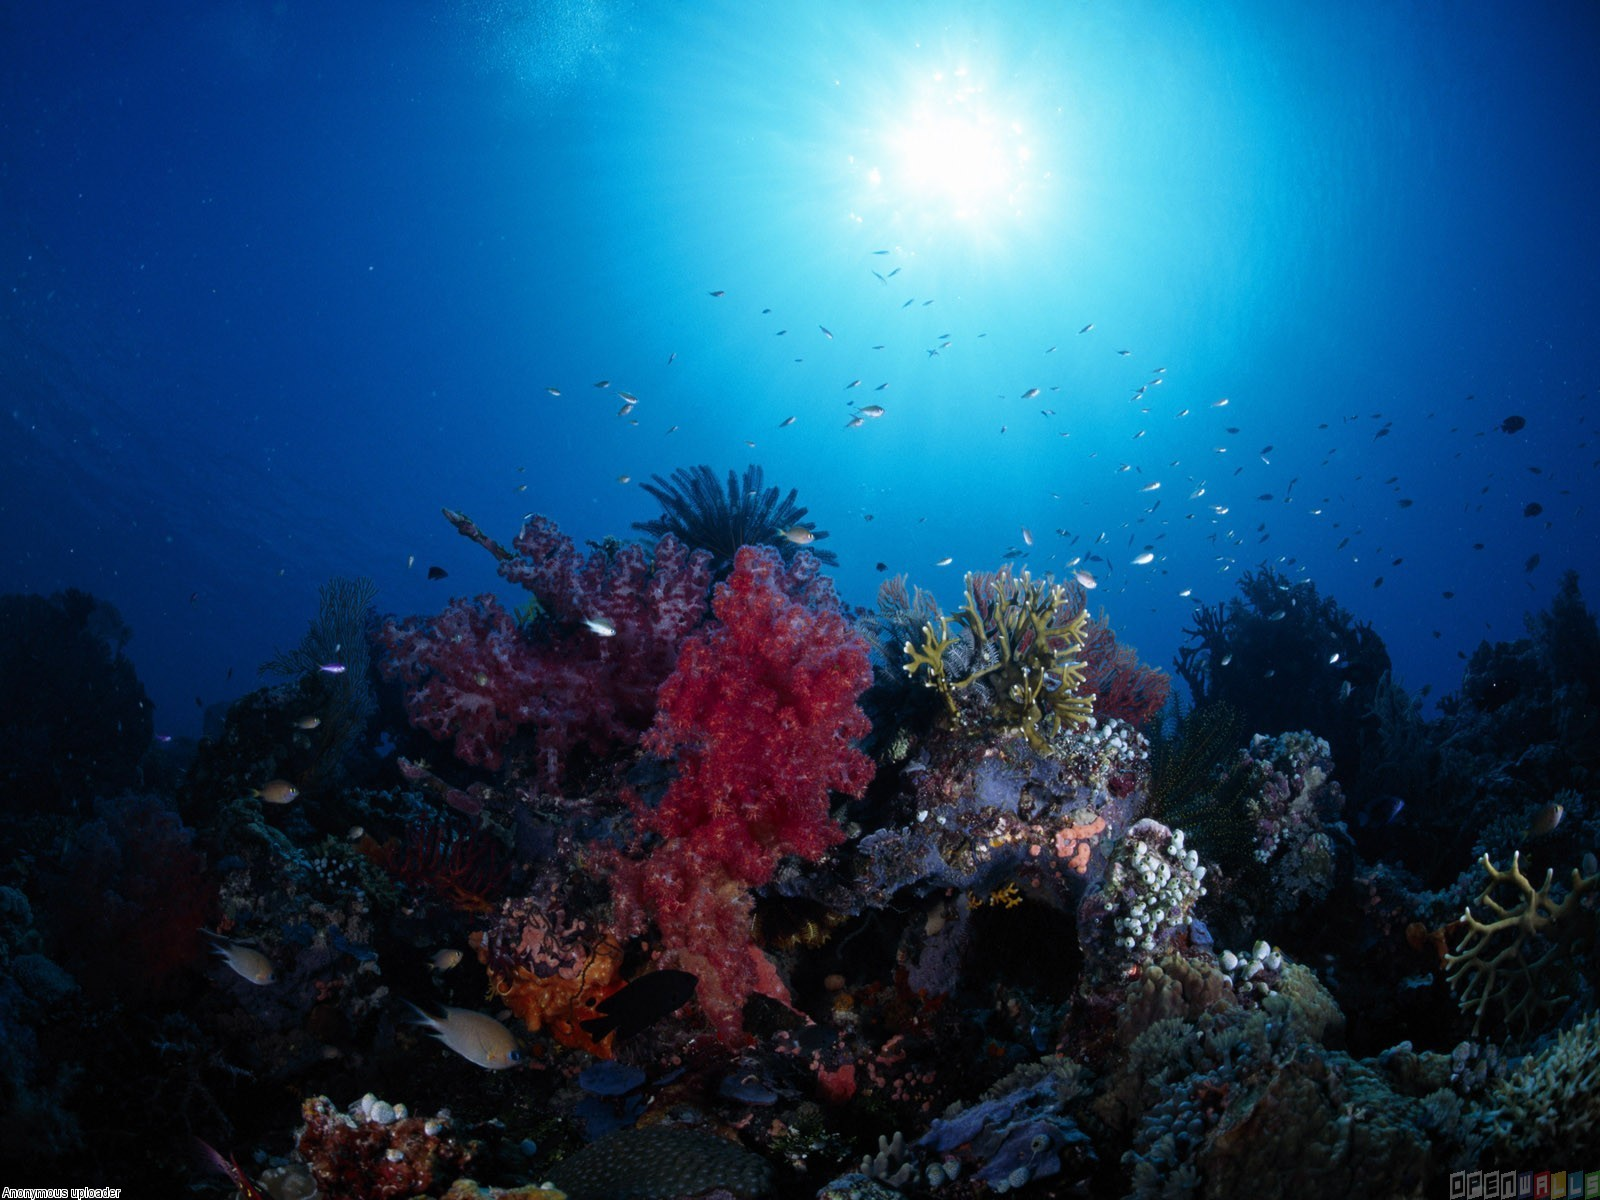 Coral reef wallpaper 3541   Open Walls 1600x1200